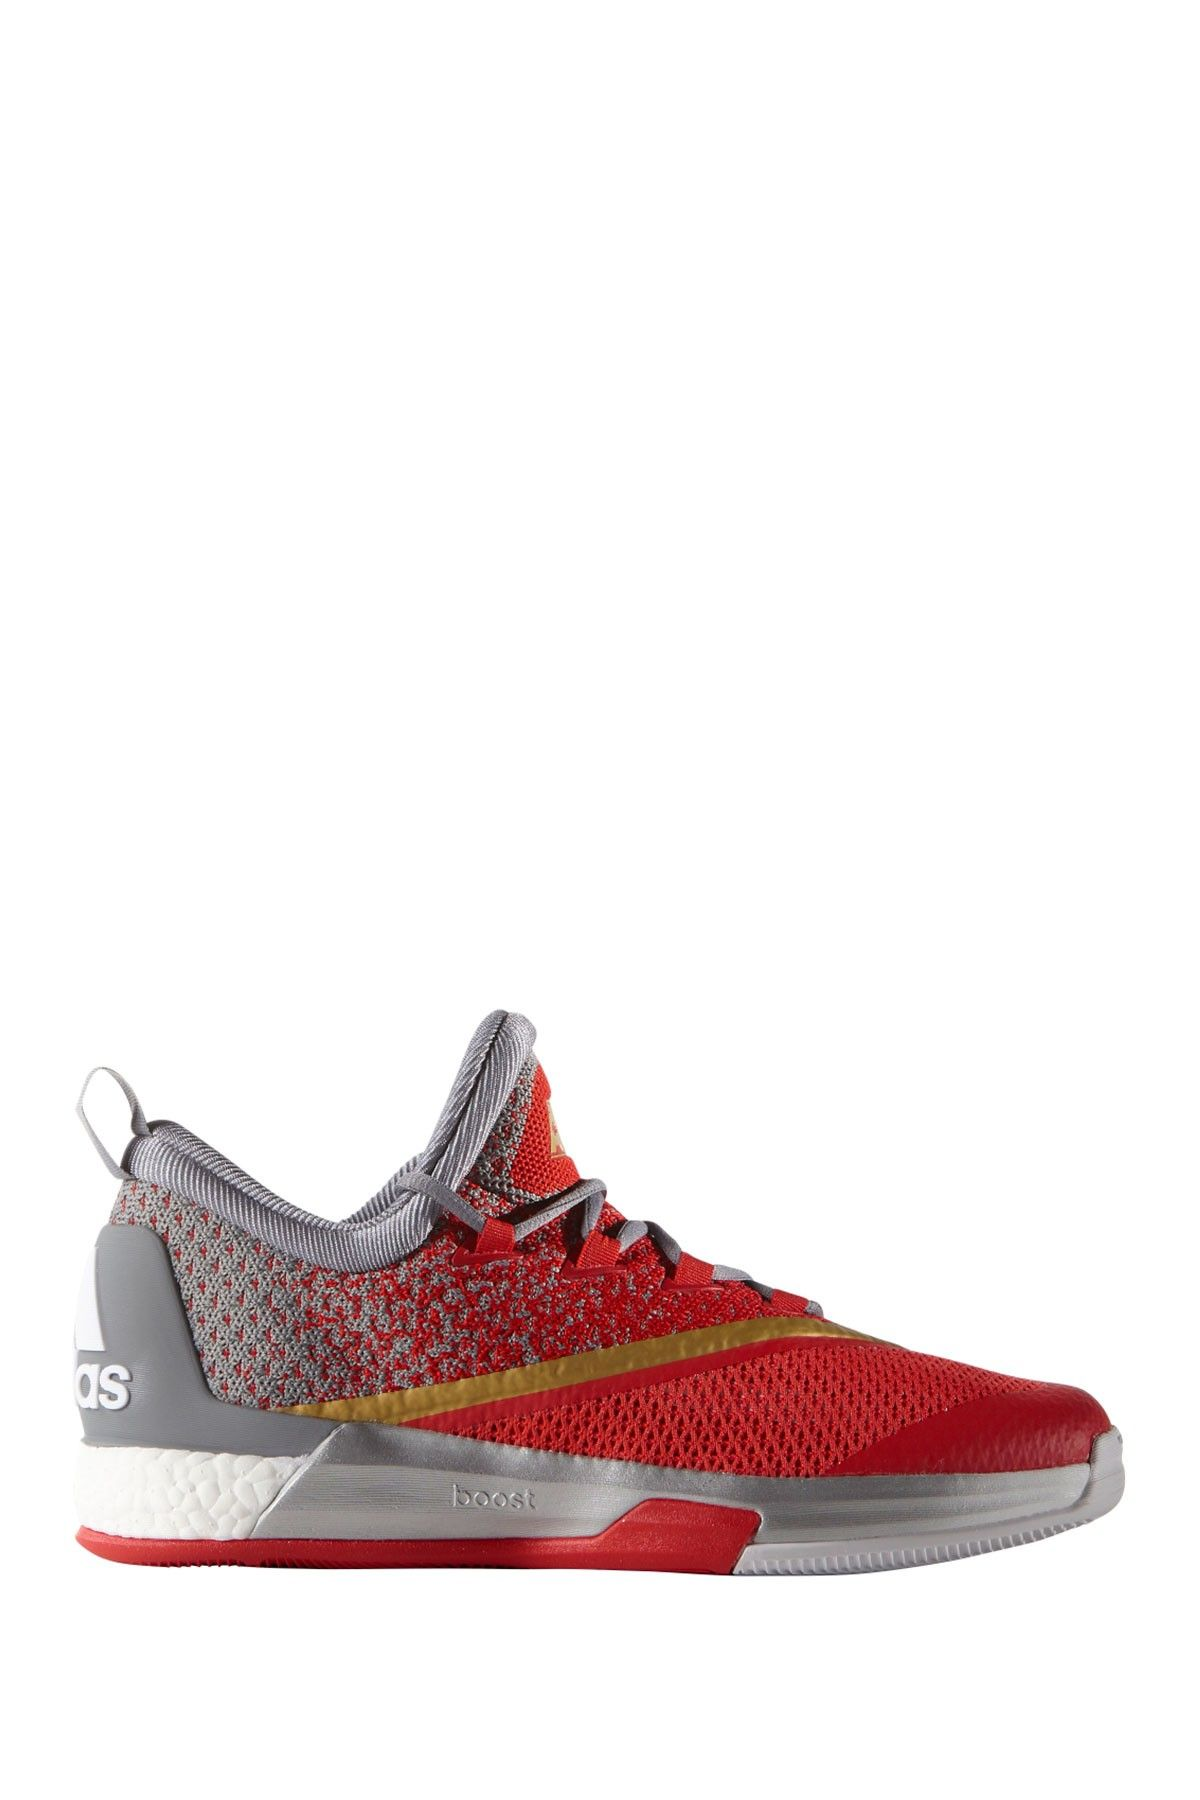 adidas Adipower de Hombres s Boost Para Zapatos de Golf, Gris (Clear Grey/Black/Bold Orange), 8 D(M) US